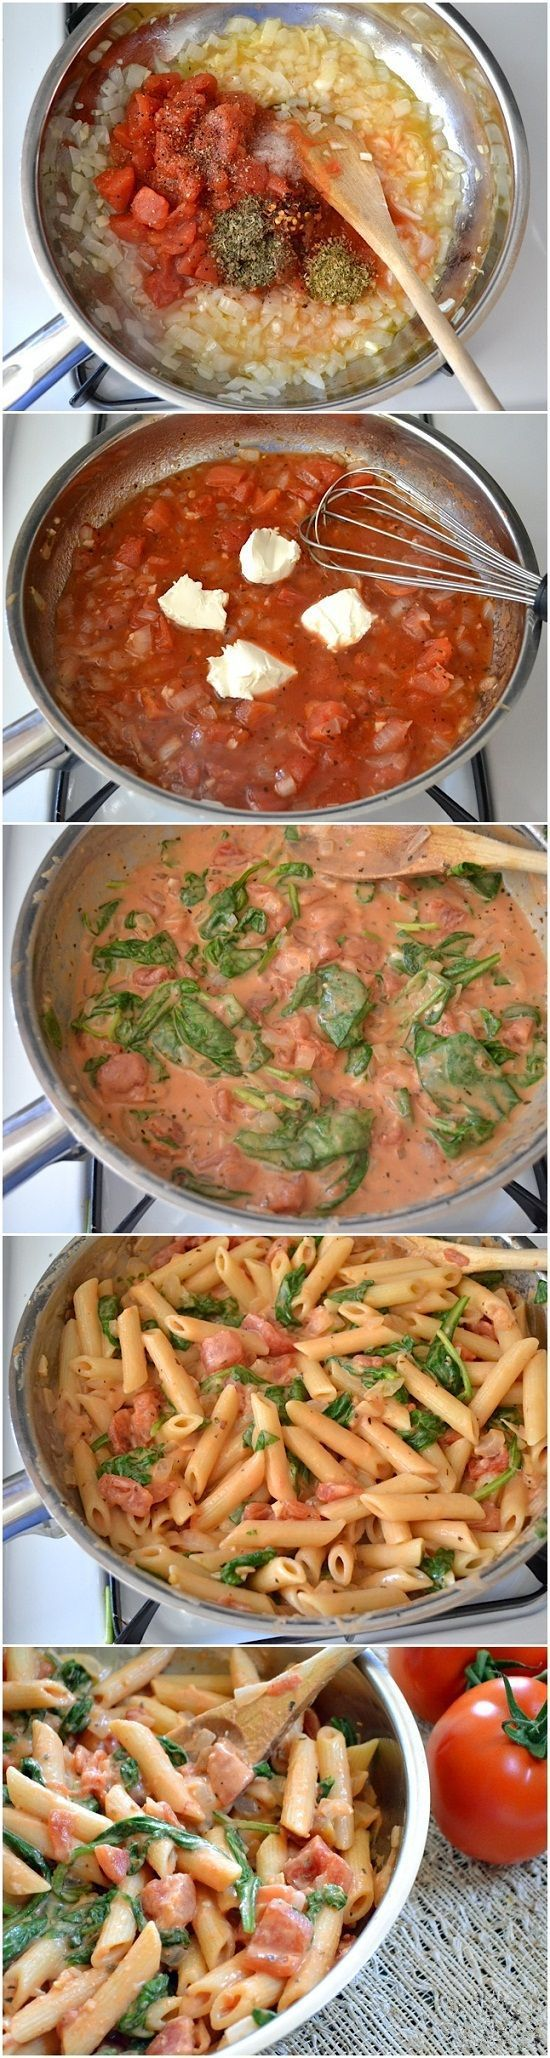 Creamy Tomato Spinach Pasta. Quick skillet pasta dishes like this Creamy Tomato Spinach Pasta are perfect for such an occasion. #cheapeats #pasta